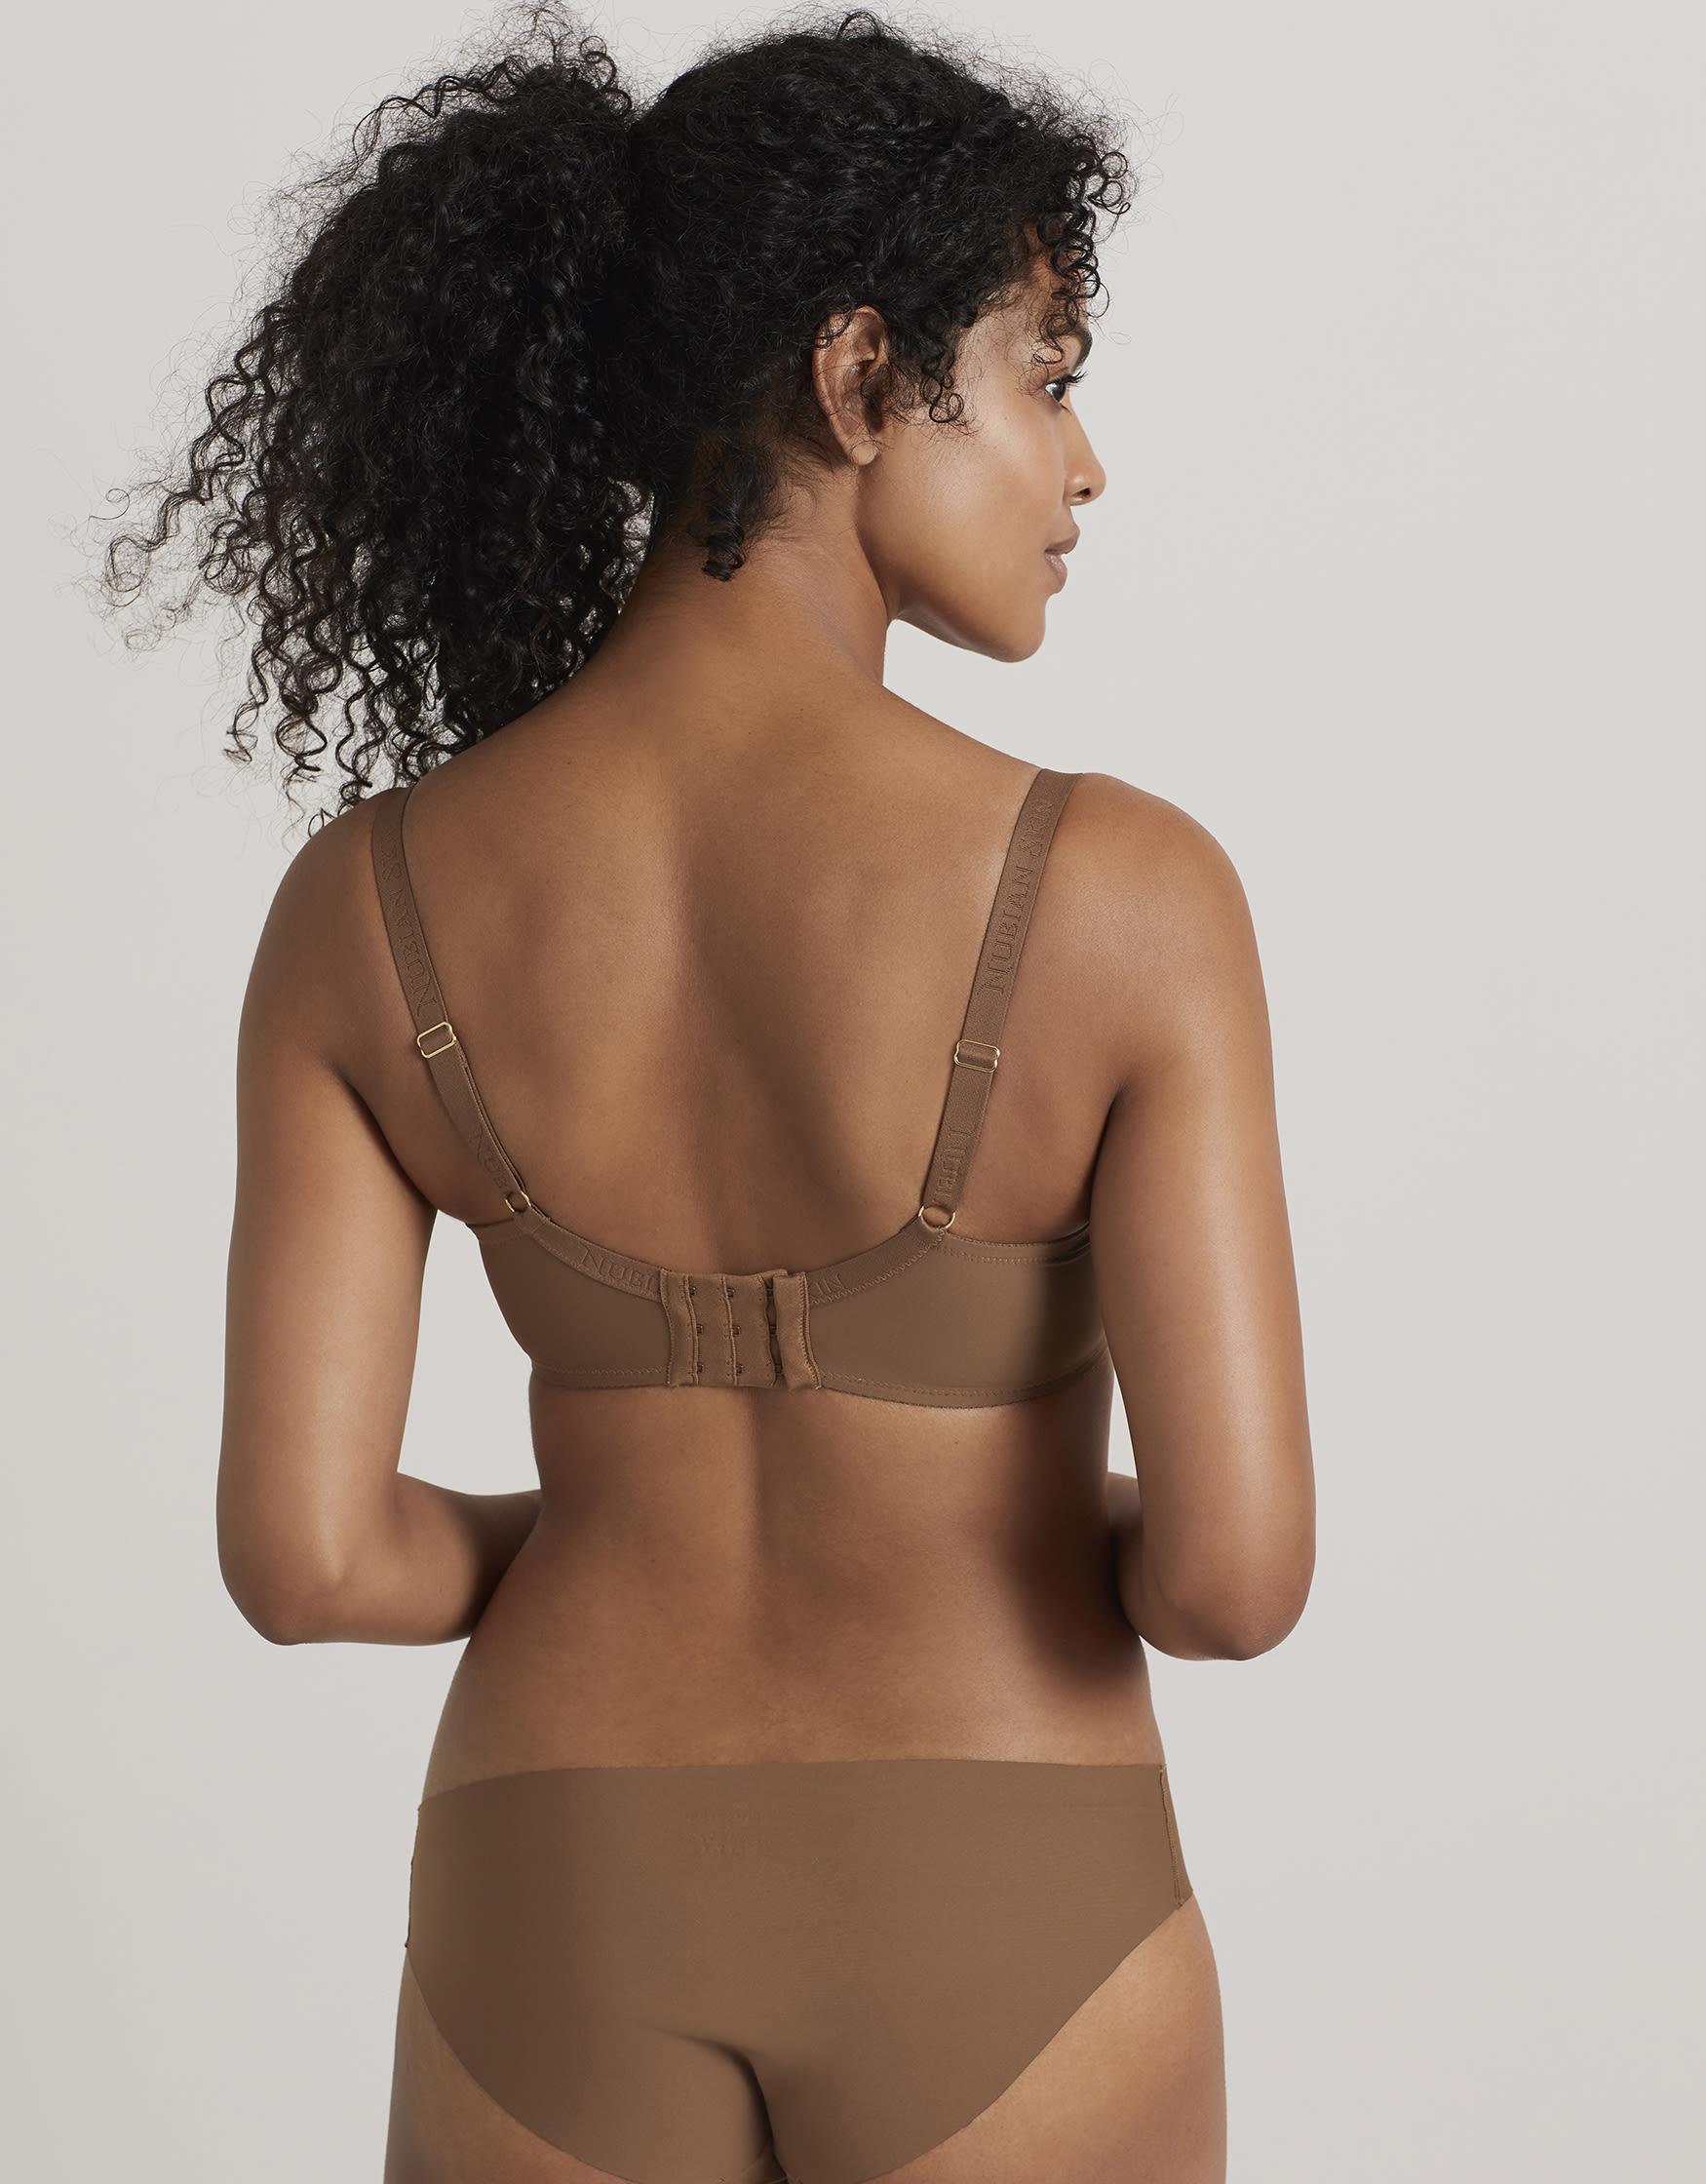 35d9ce32362 Nubian Skin Lingerie